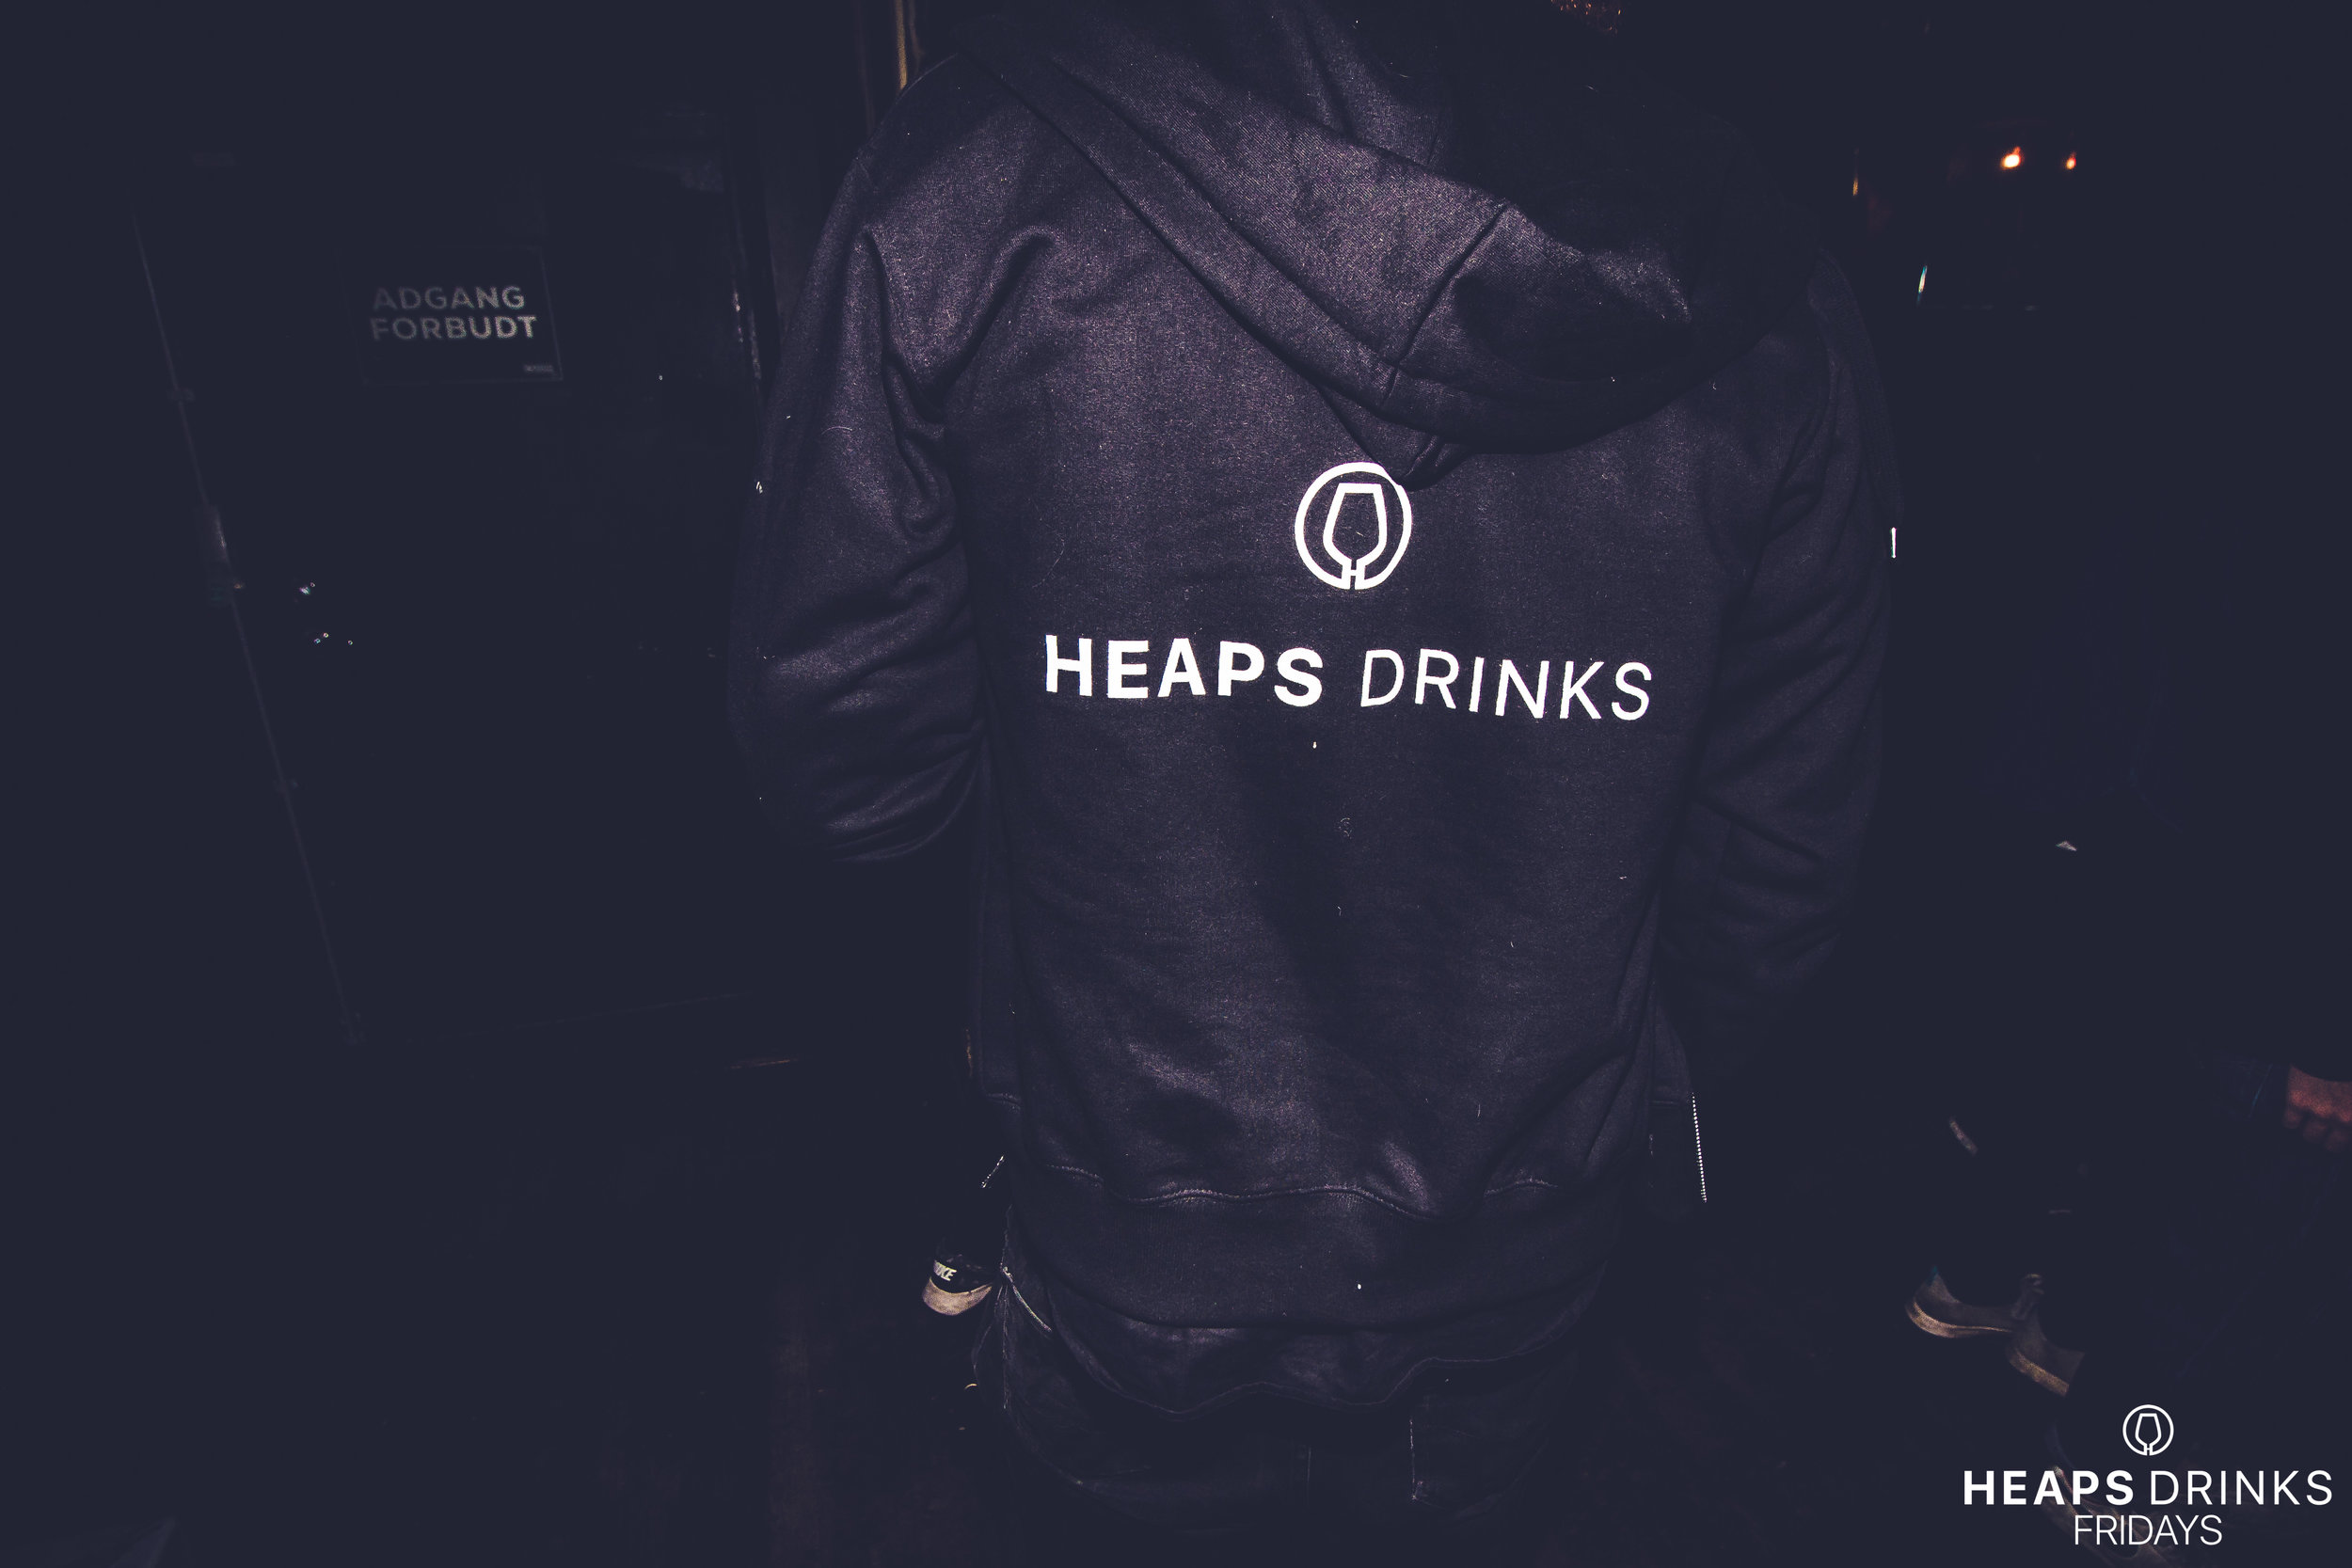 Heaps_drinks_44.jpg